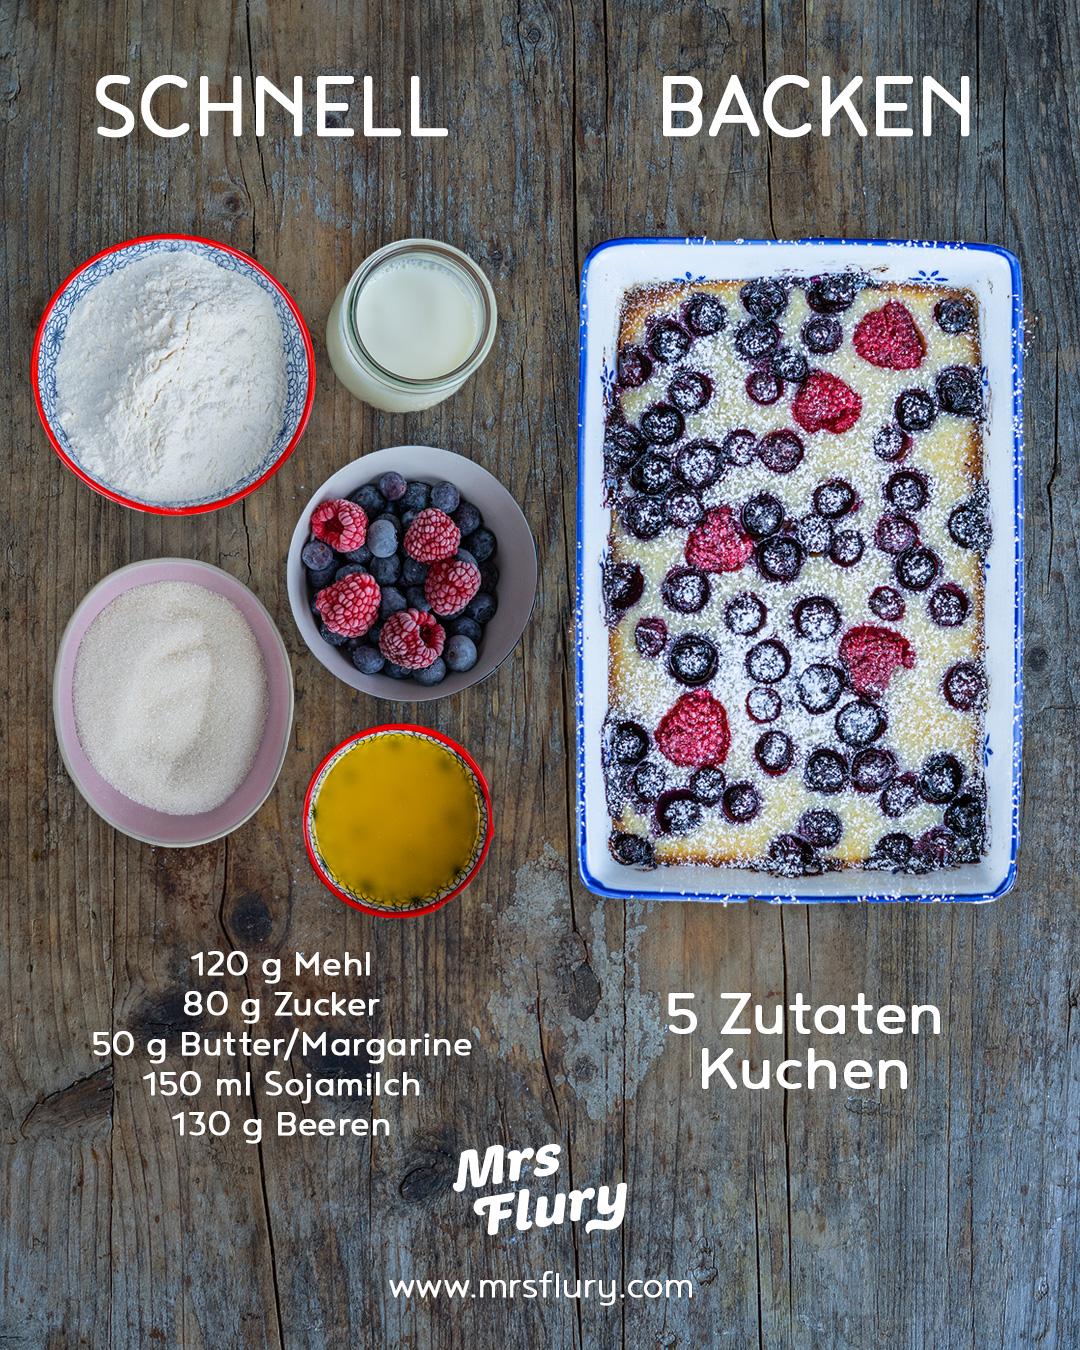 5 Zutaten Kuchen vegan Mrs Flury